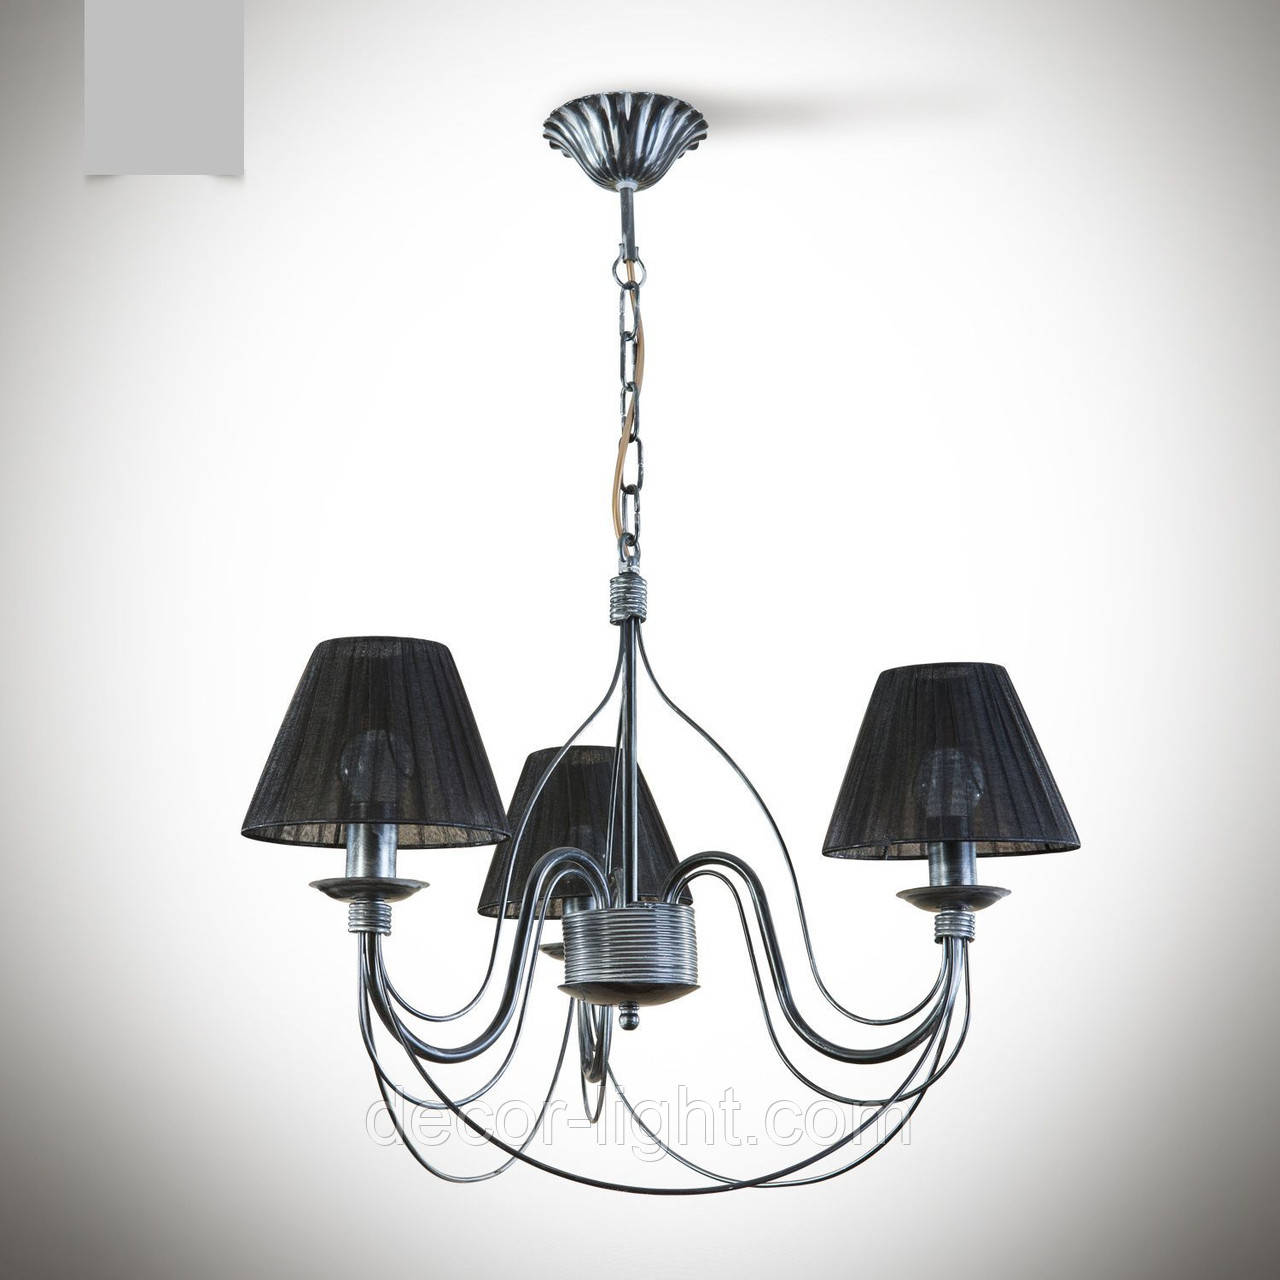 Люстра 3 ламповая для спальни, зала, небольшой комнаты с абажурами  18333-8